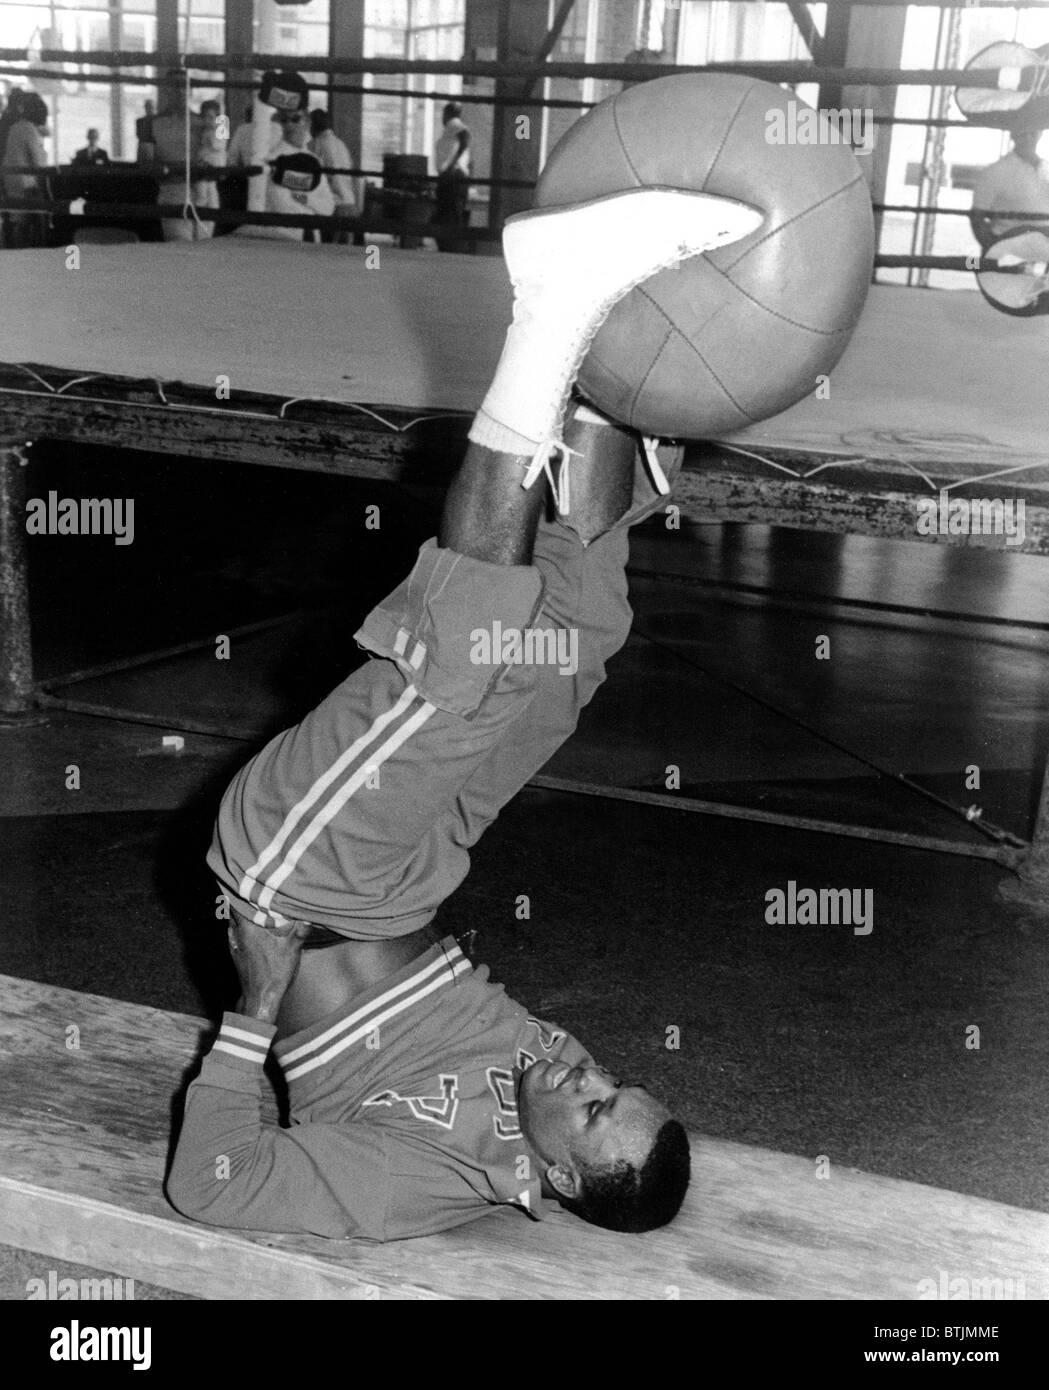 Joe Frazier in training at the Concord Hotel for bout with Oscar Bonavena, Kiamesha Lake, NY 9/13/1966 - Stock Image